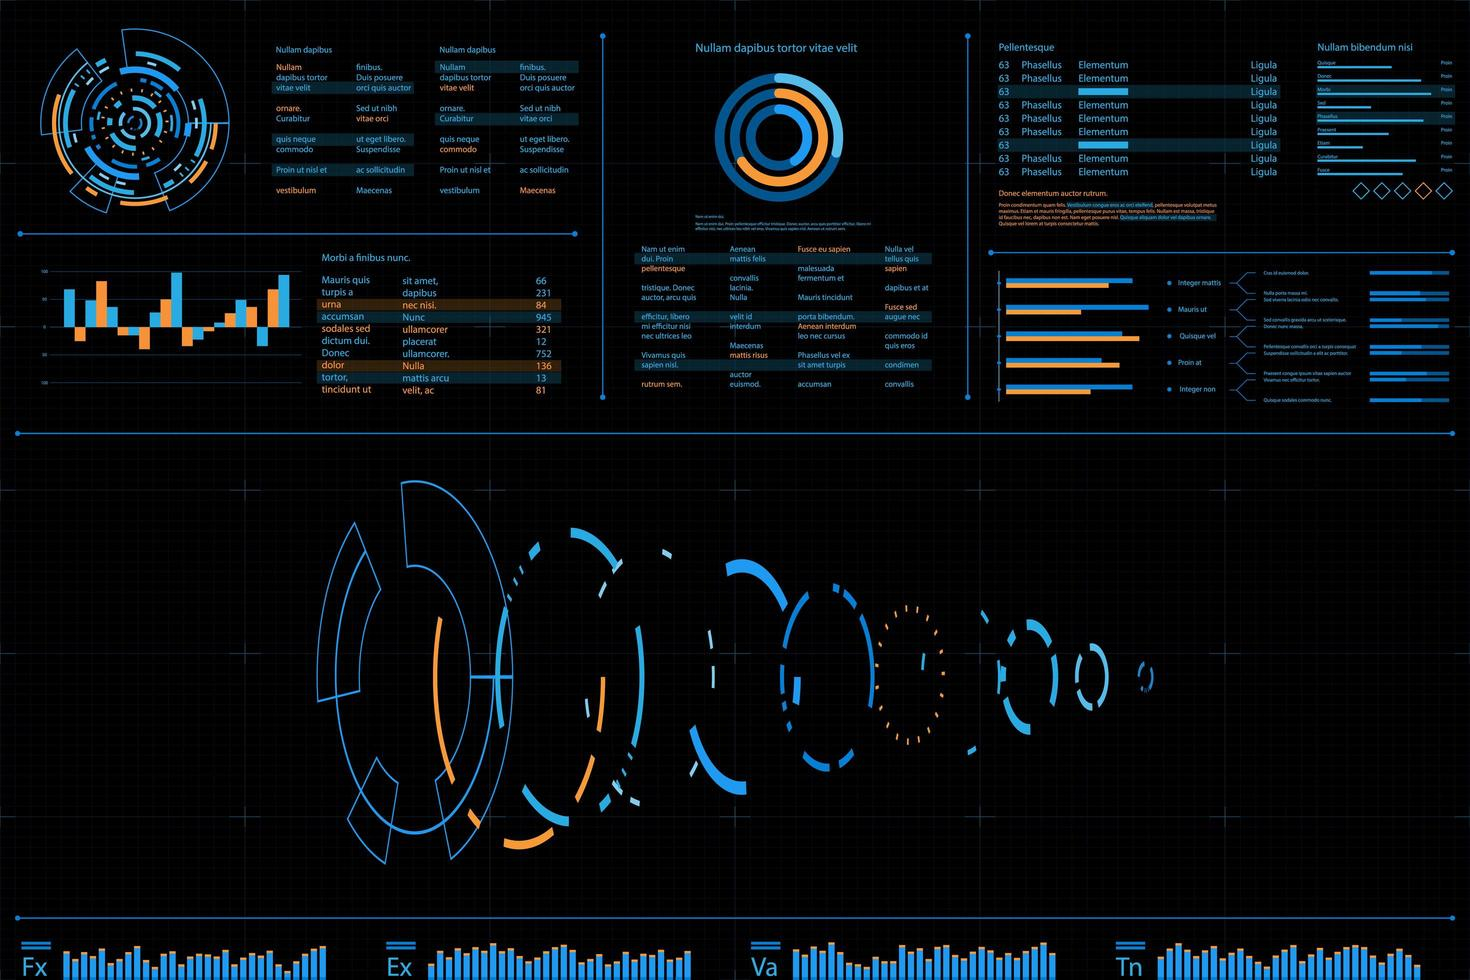 Tablero de datos futurista con diseño en espiral vector